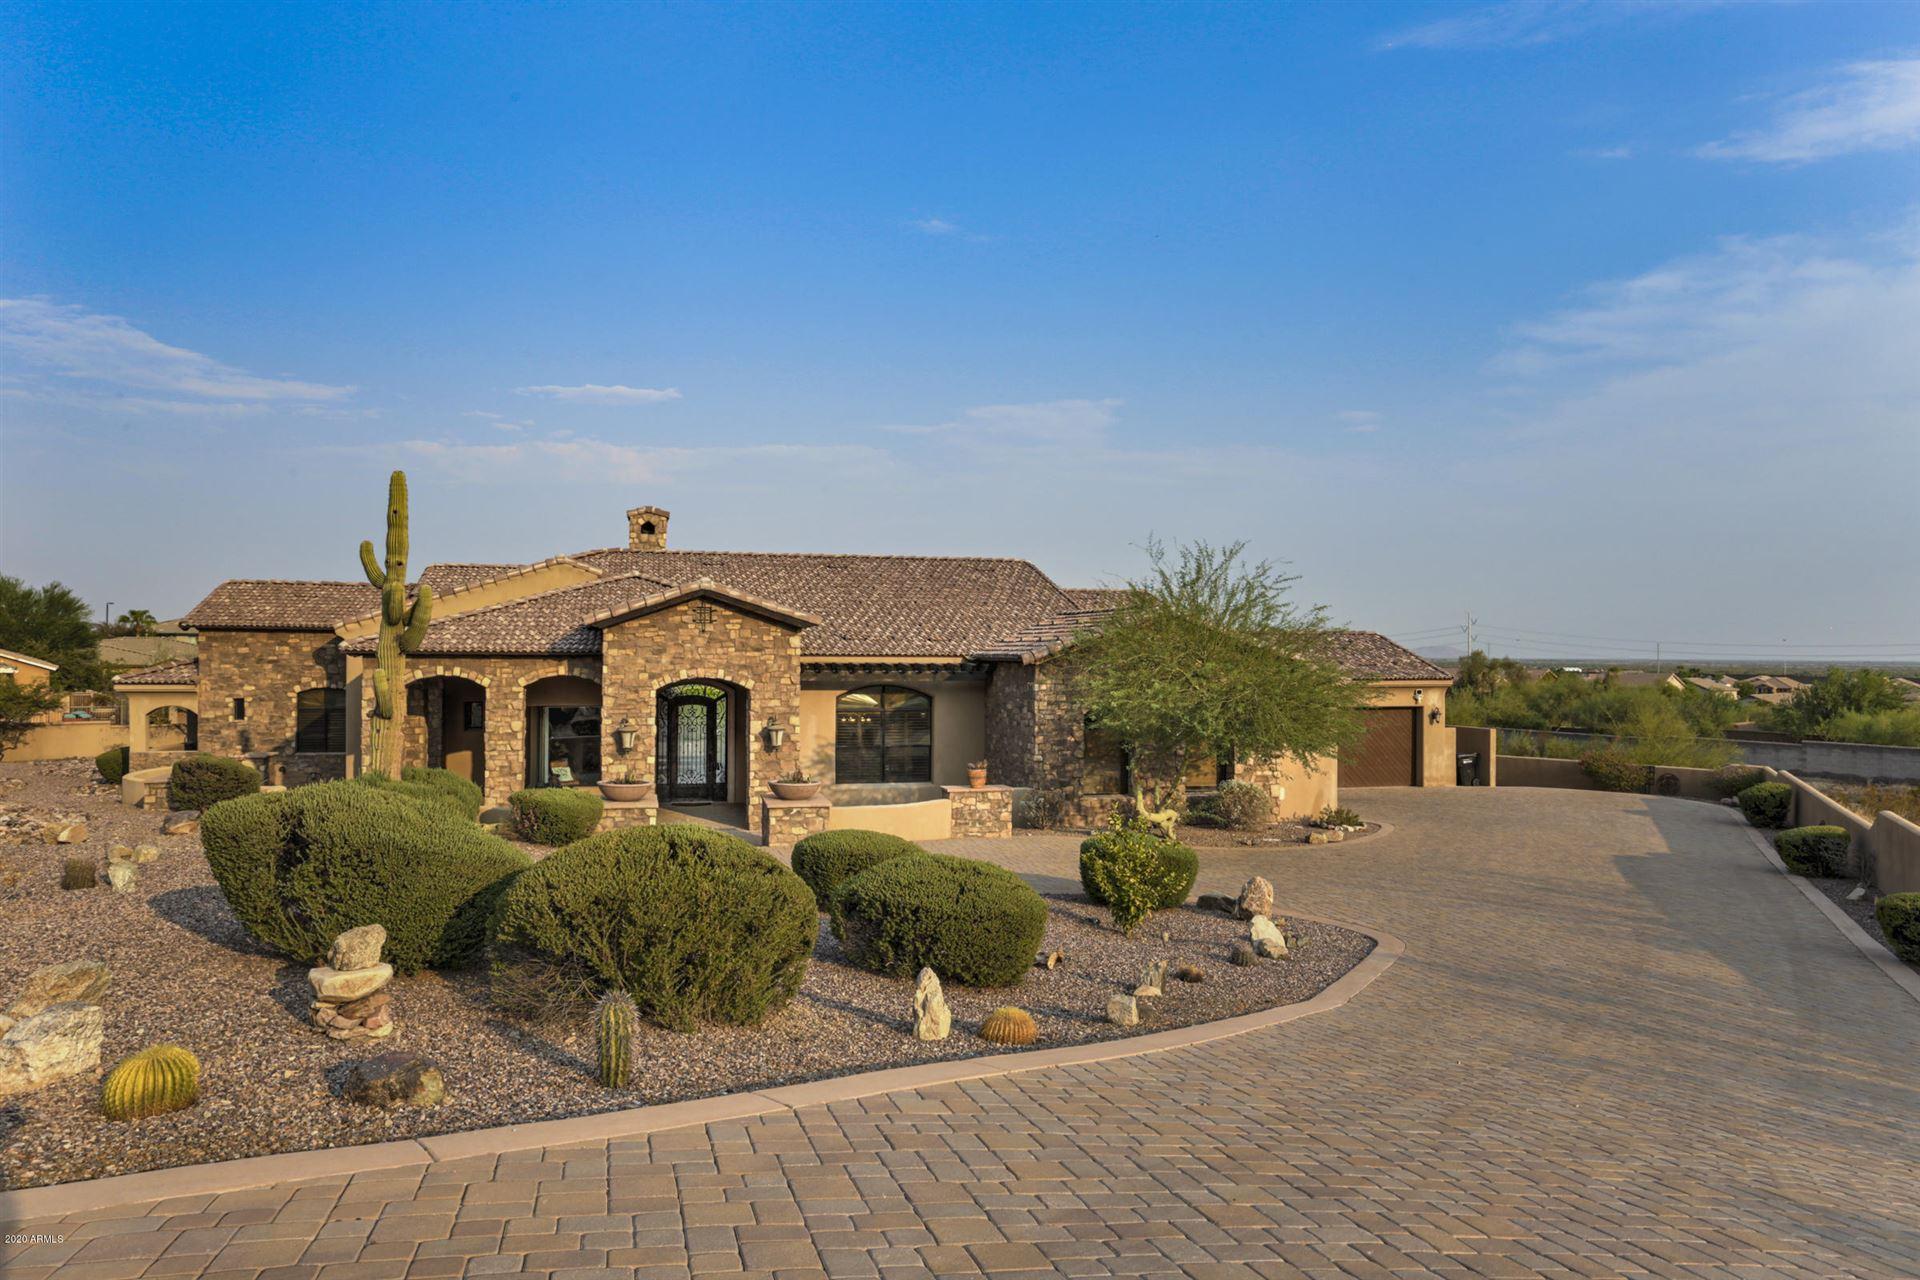 3043 W BRIARWOOD Terrace, Phoenix, AZ 85045 - MLS#: 6116277